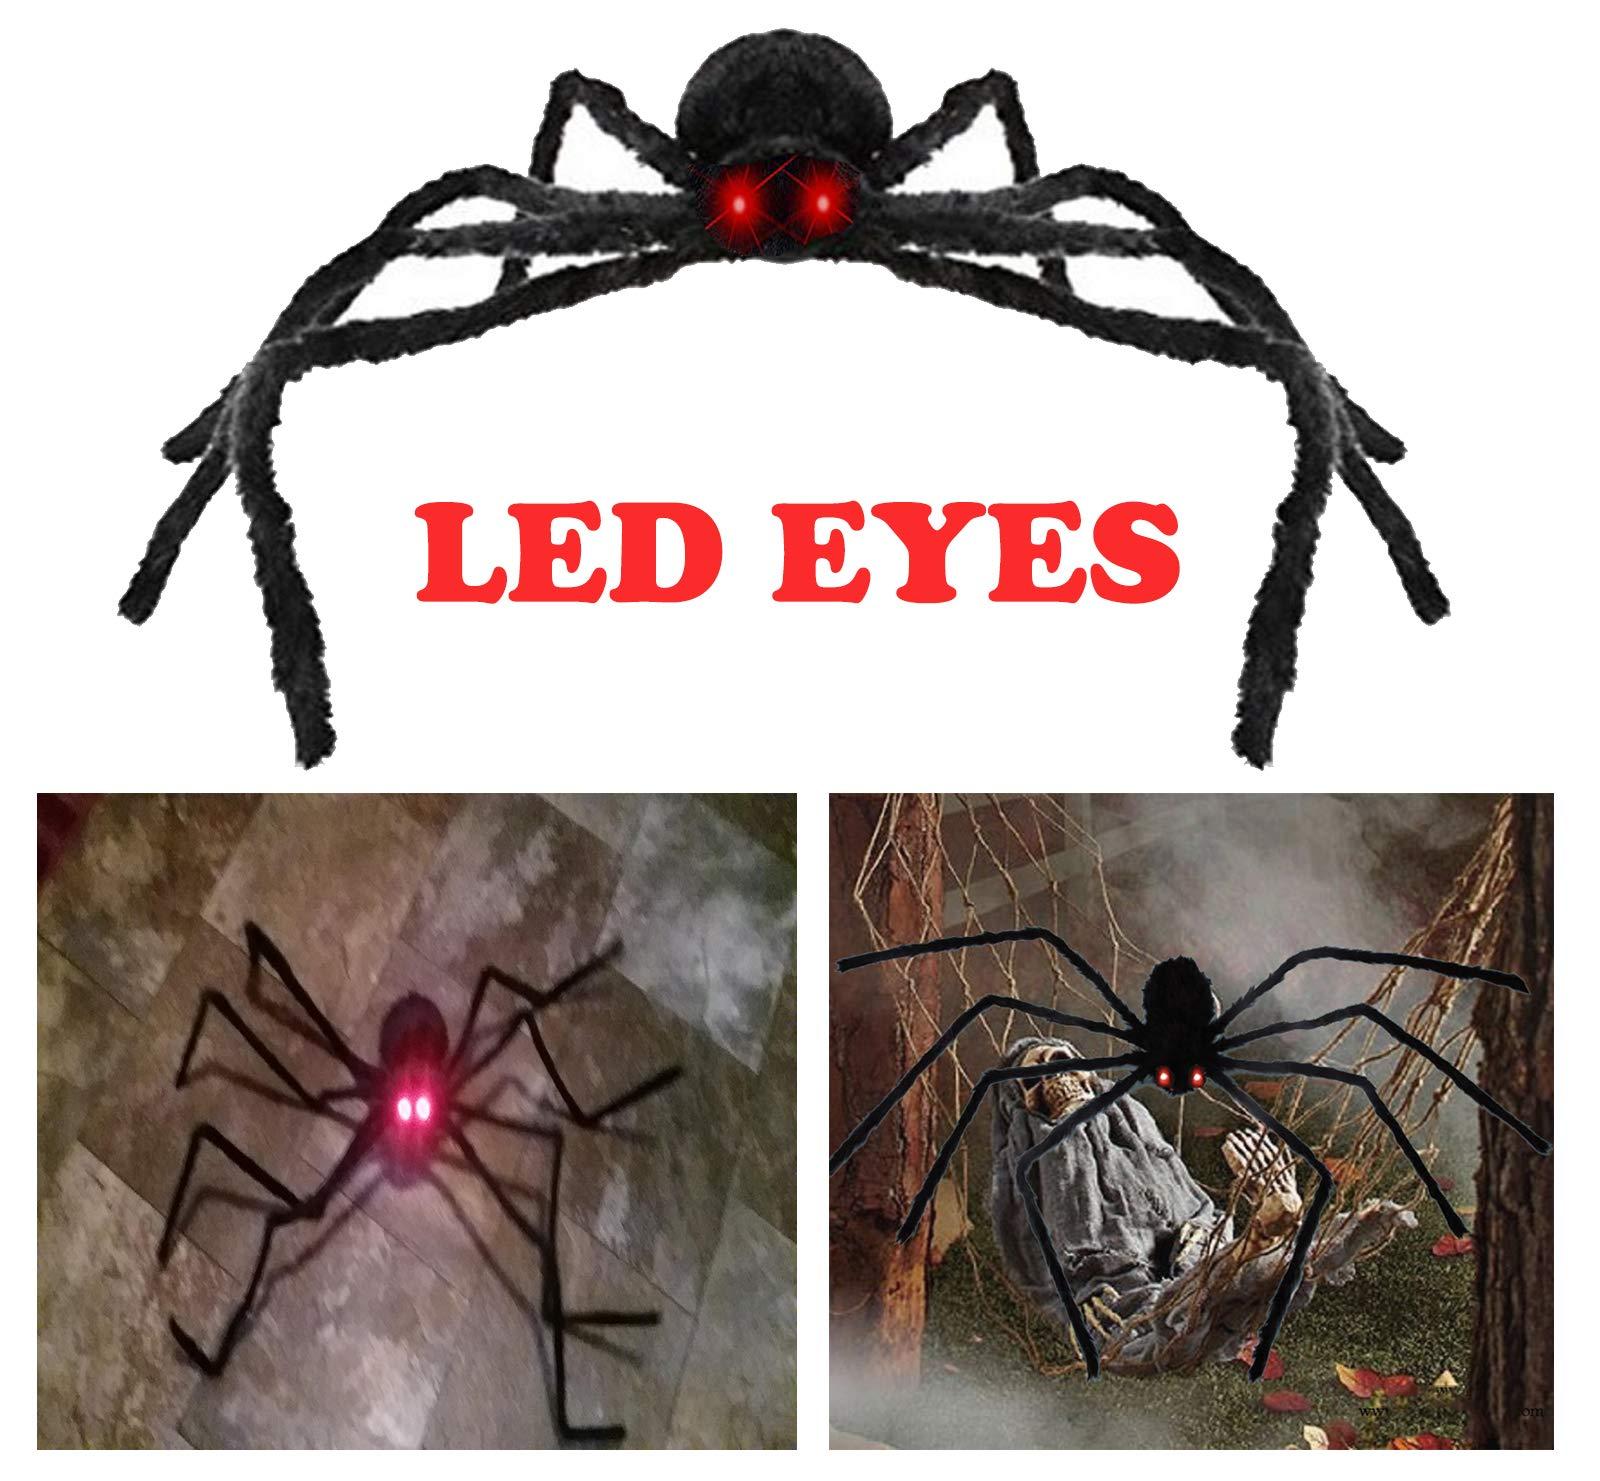 AISENO Giant Spider 4.2FT/125cm with LED Eyes